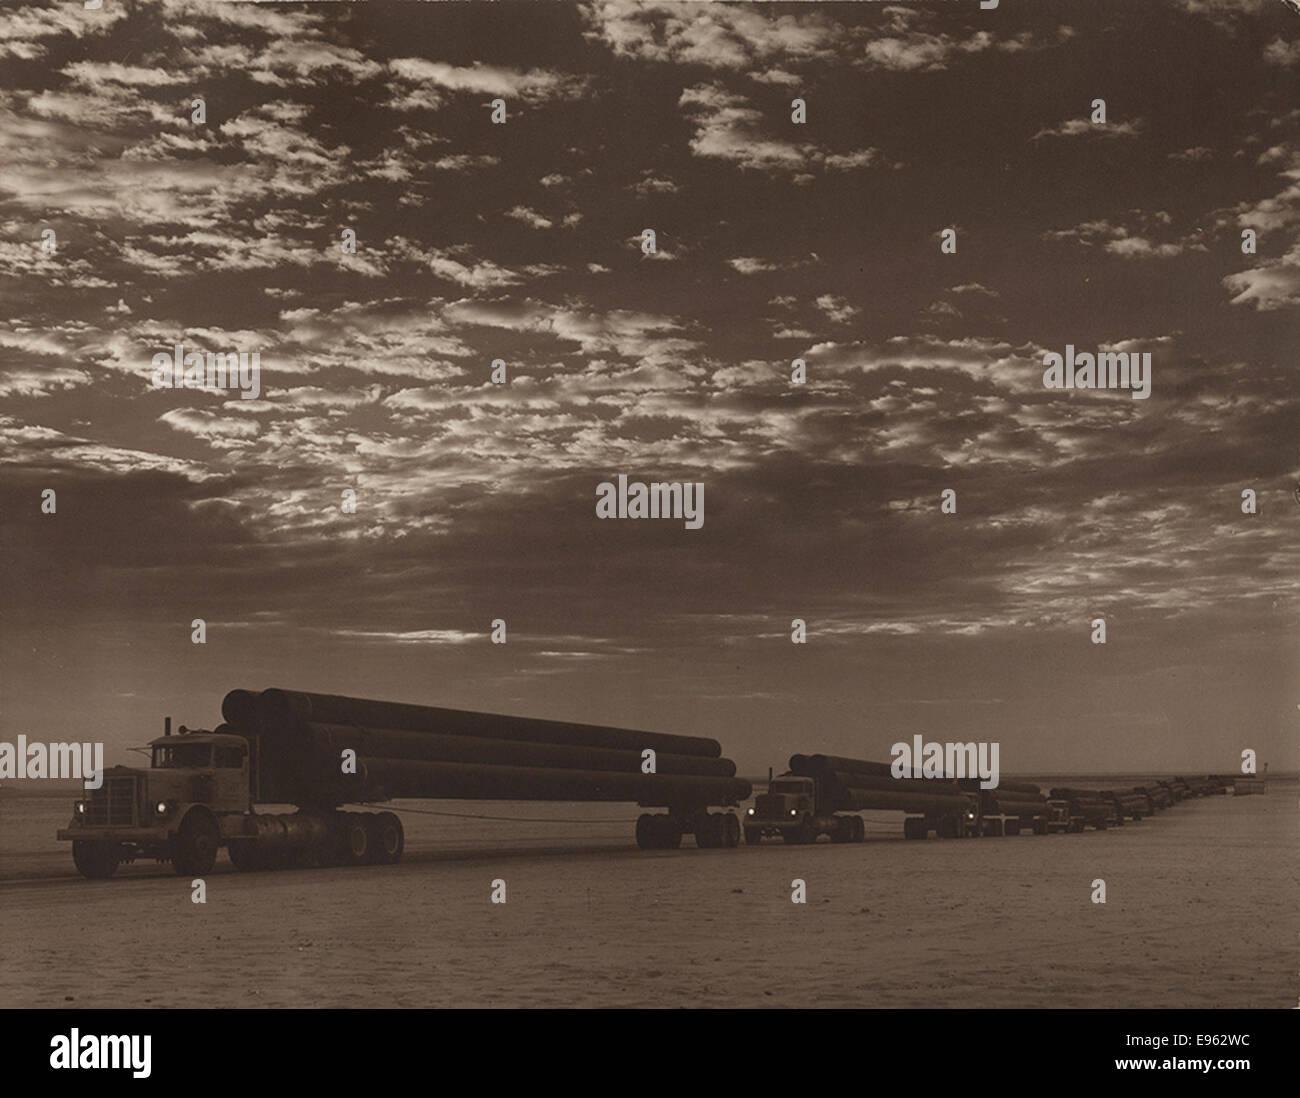 Trucks loaded with line pipe, Arabian American Oil Co